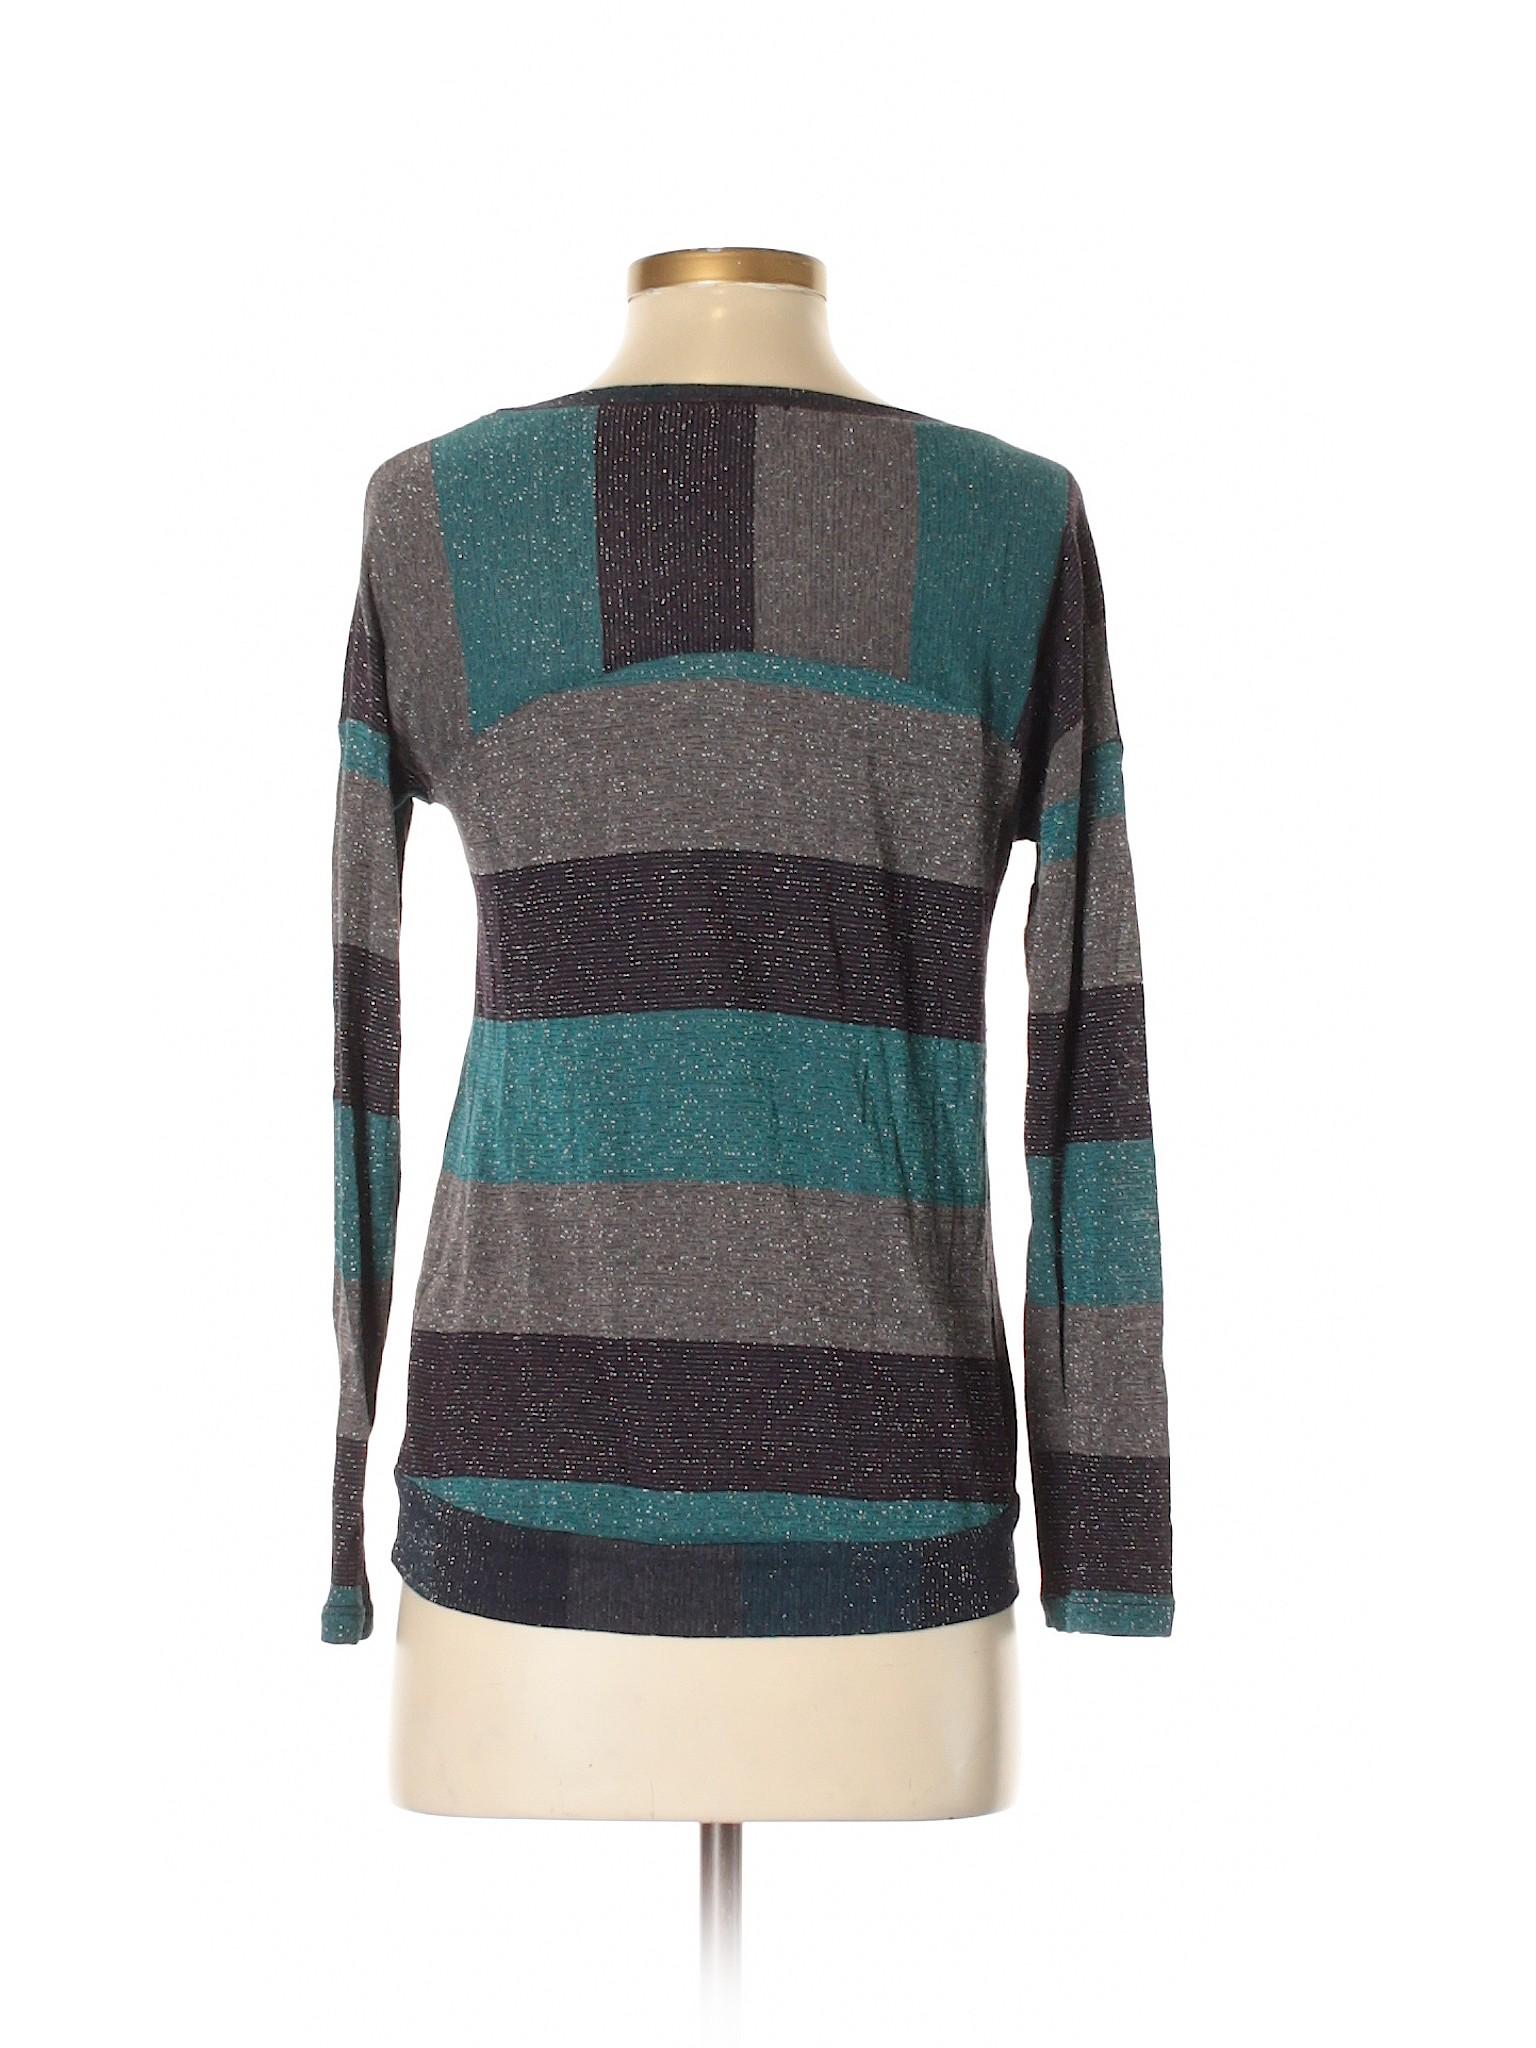 Pullover Splendid Pullover winter Boutique Boutique Splendid Sweater winter n8RPqYpxw